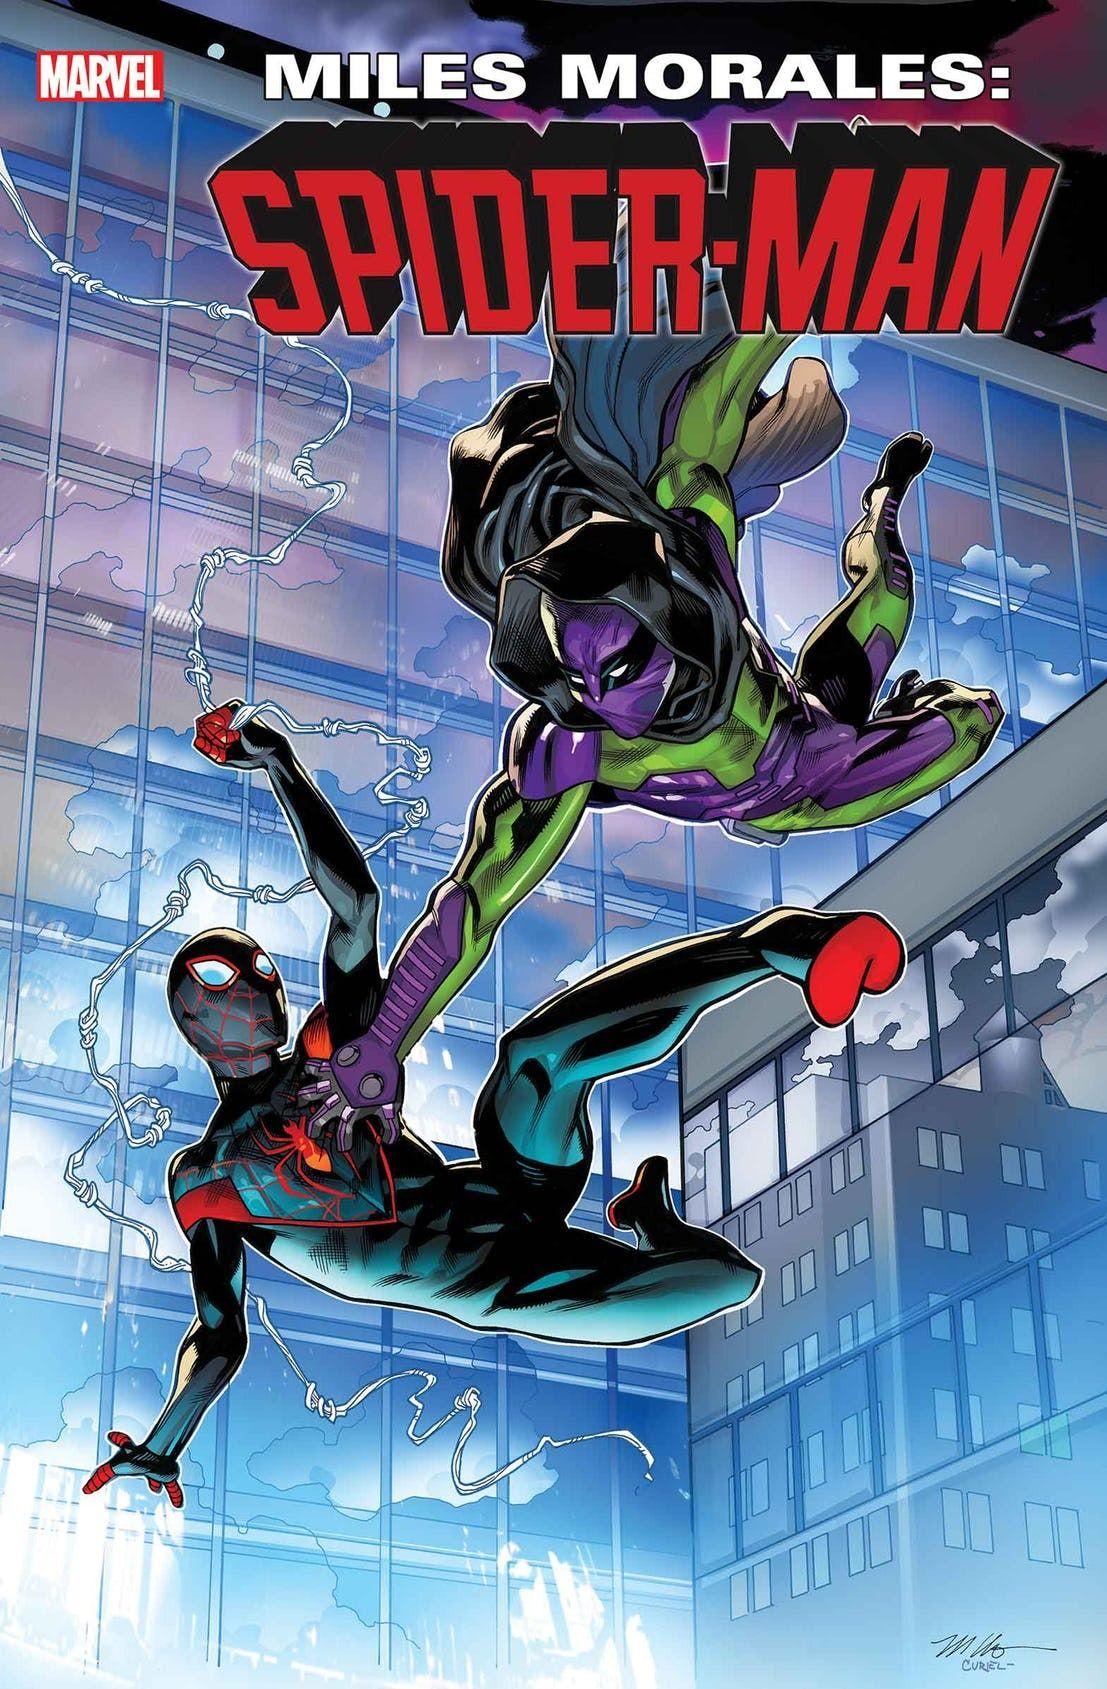 Miles morales spiderman 11 by mike hawthorne marvel